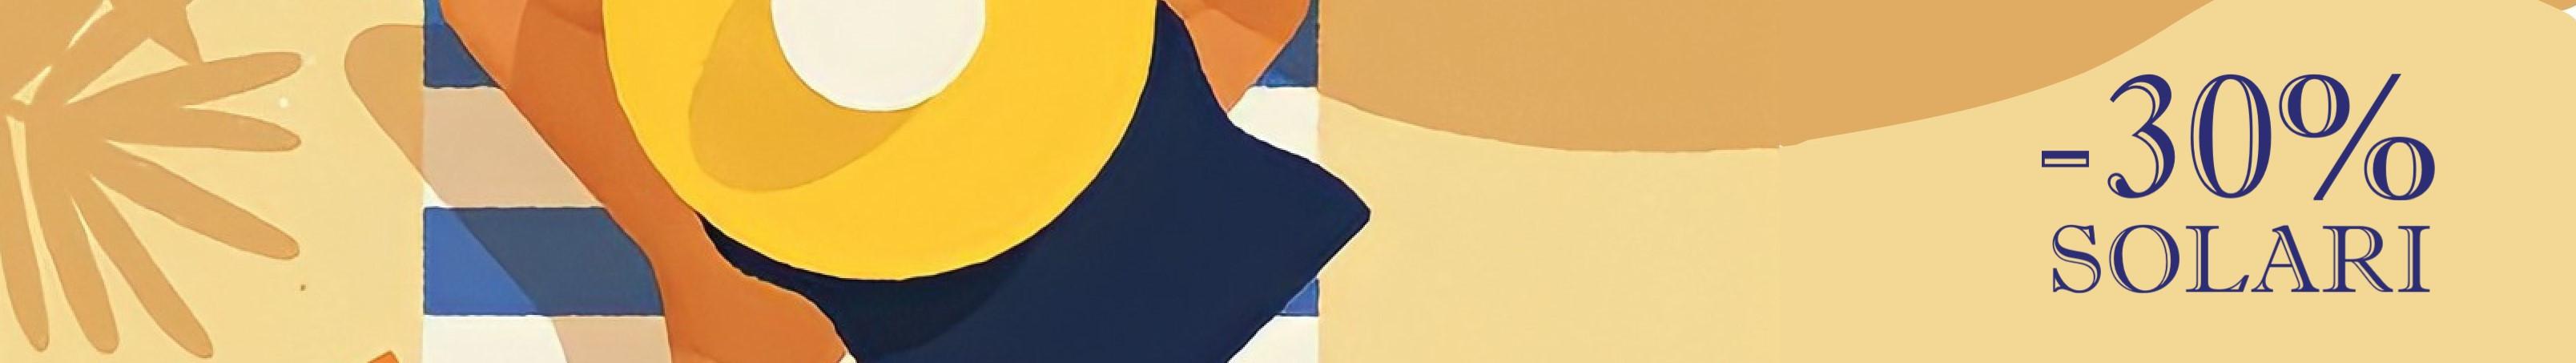 banner_Tavola disegno 1 brand page.jpg